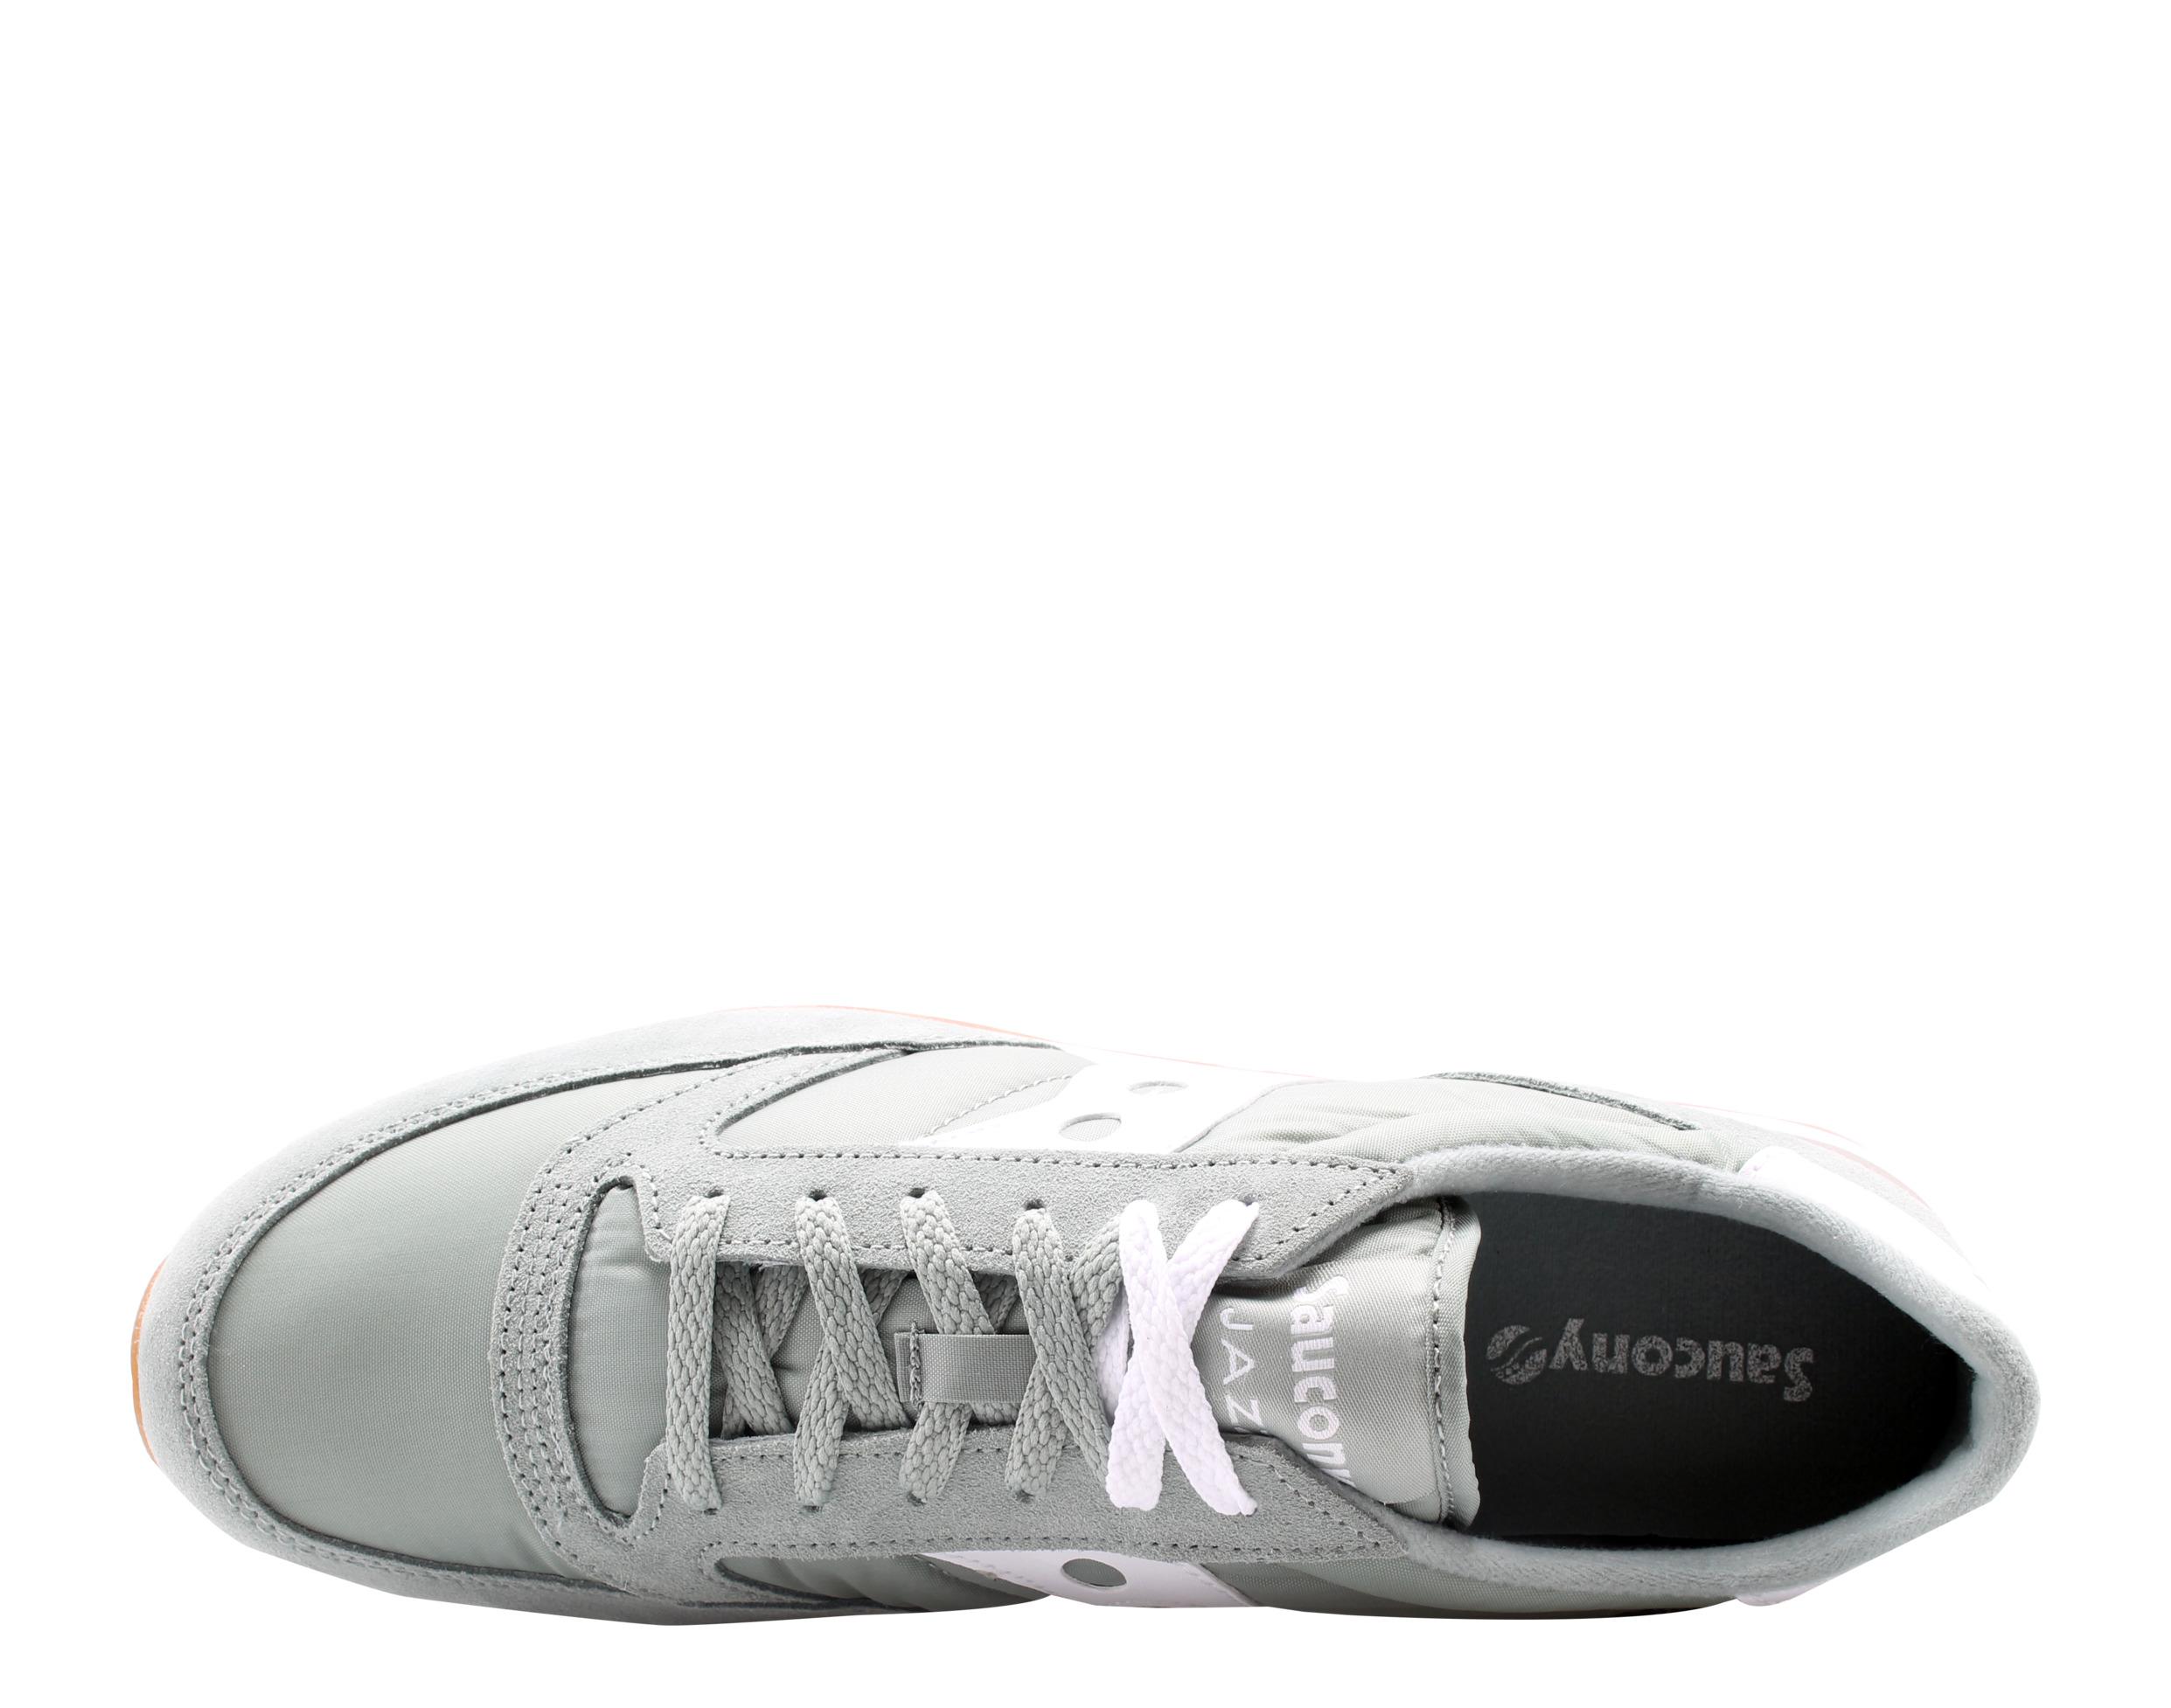 Saucony Jazz Original Green/White Men's Running Shoes S2044-436